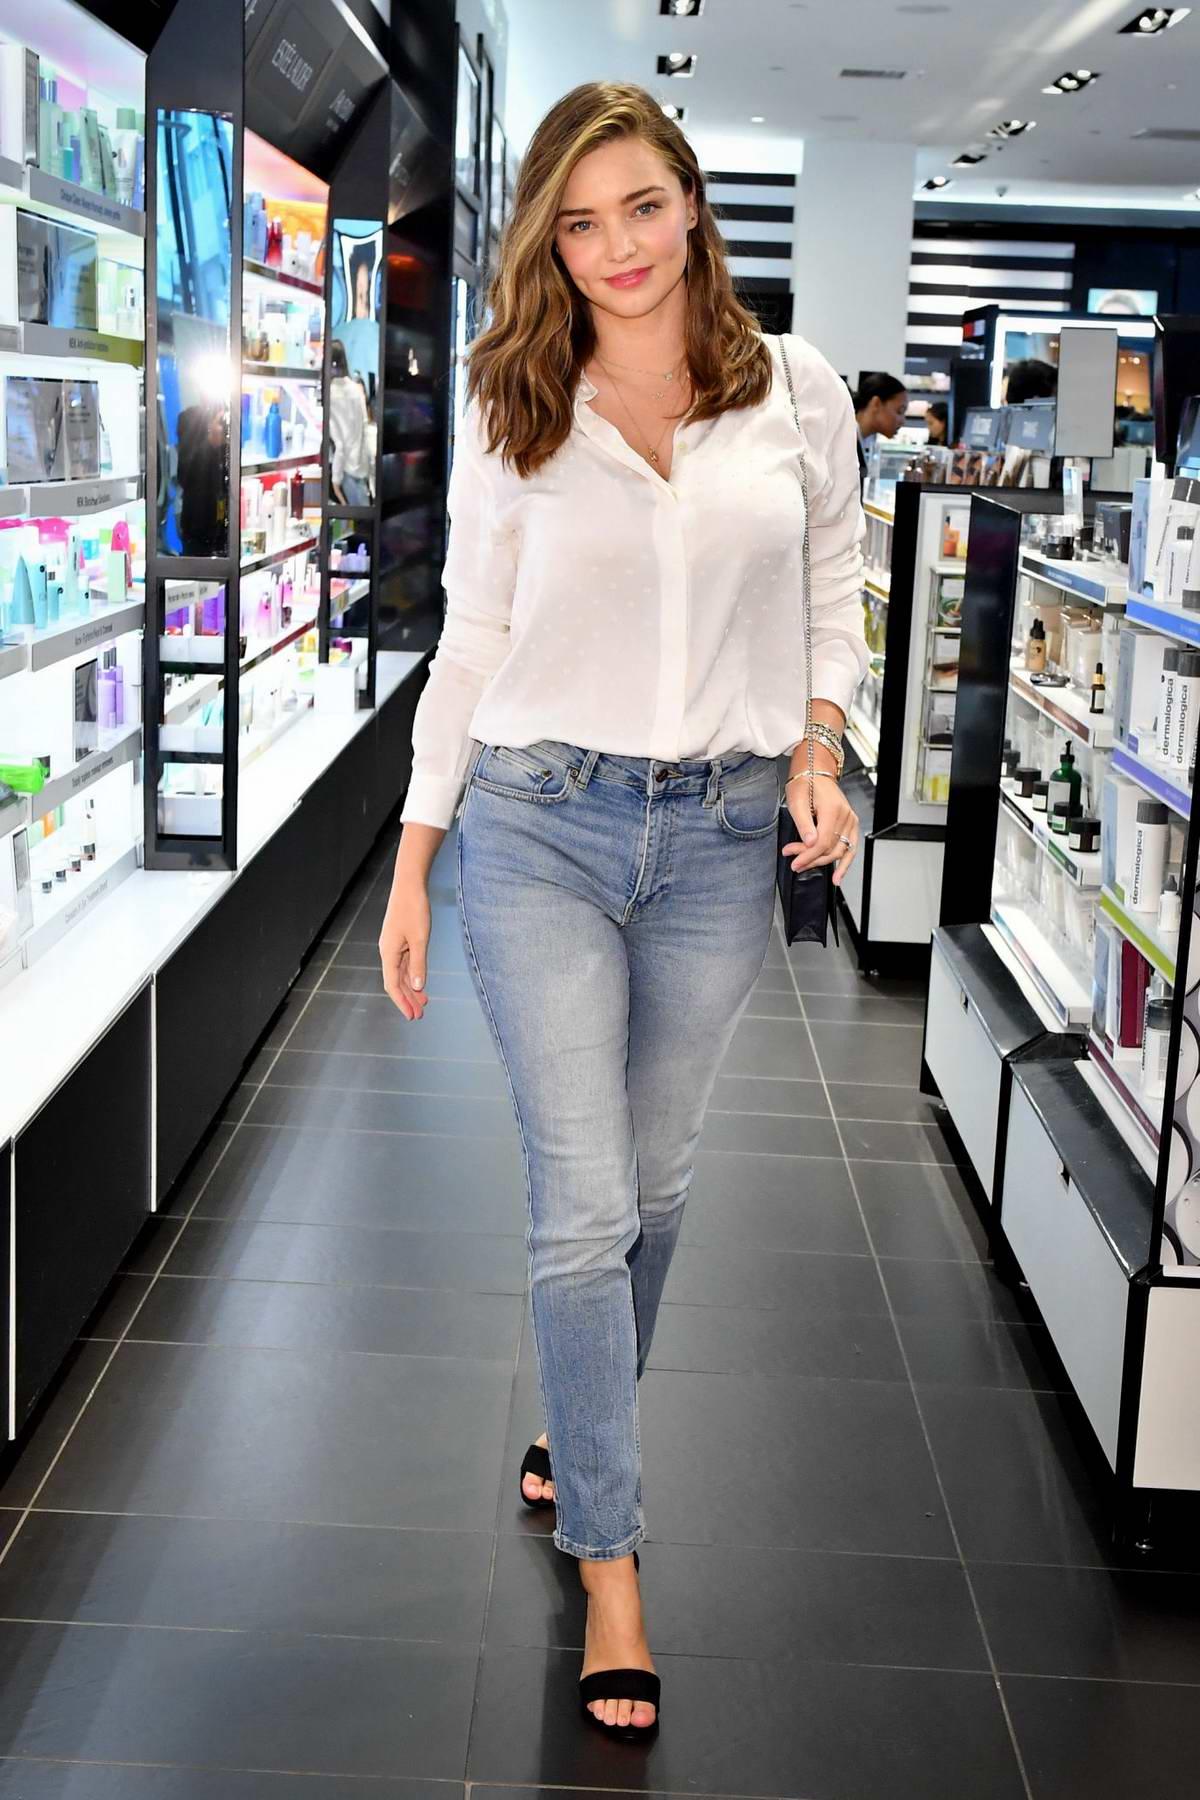 Miranda Kerr attends KORA Organics personal appearance at Sephora in Toronto, Canada